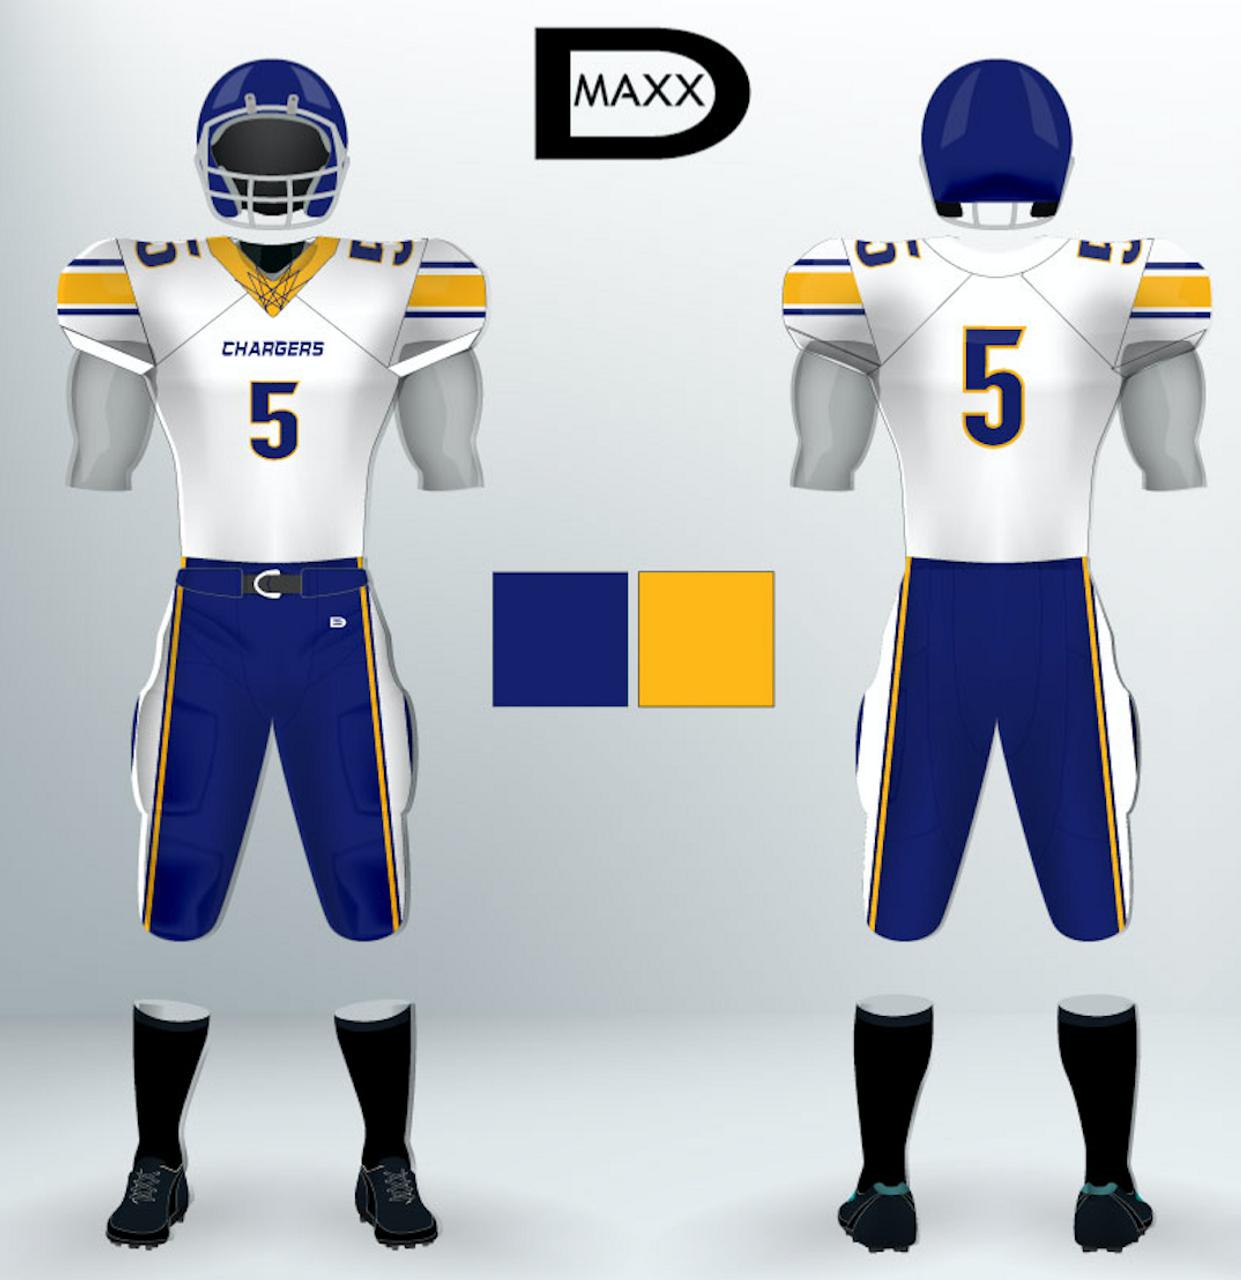 size 40 85dfe e8a5d Sublimated Football Uniforms Order@dmaxxsports.com